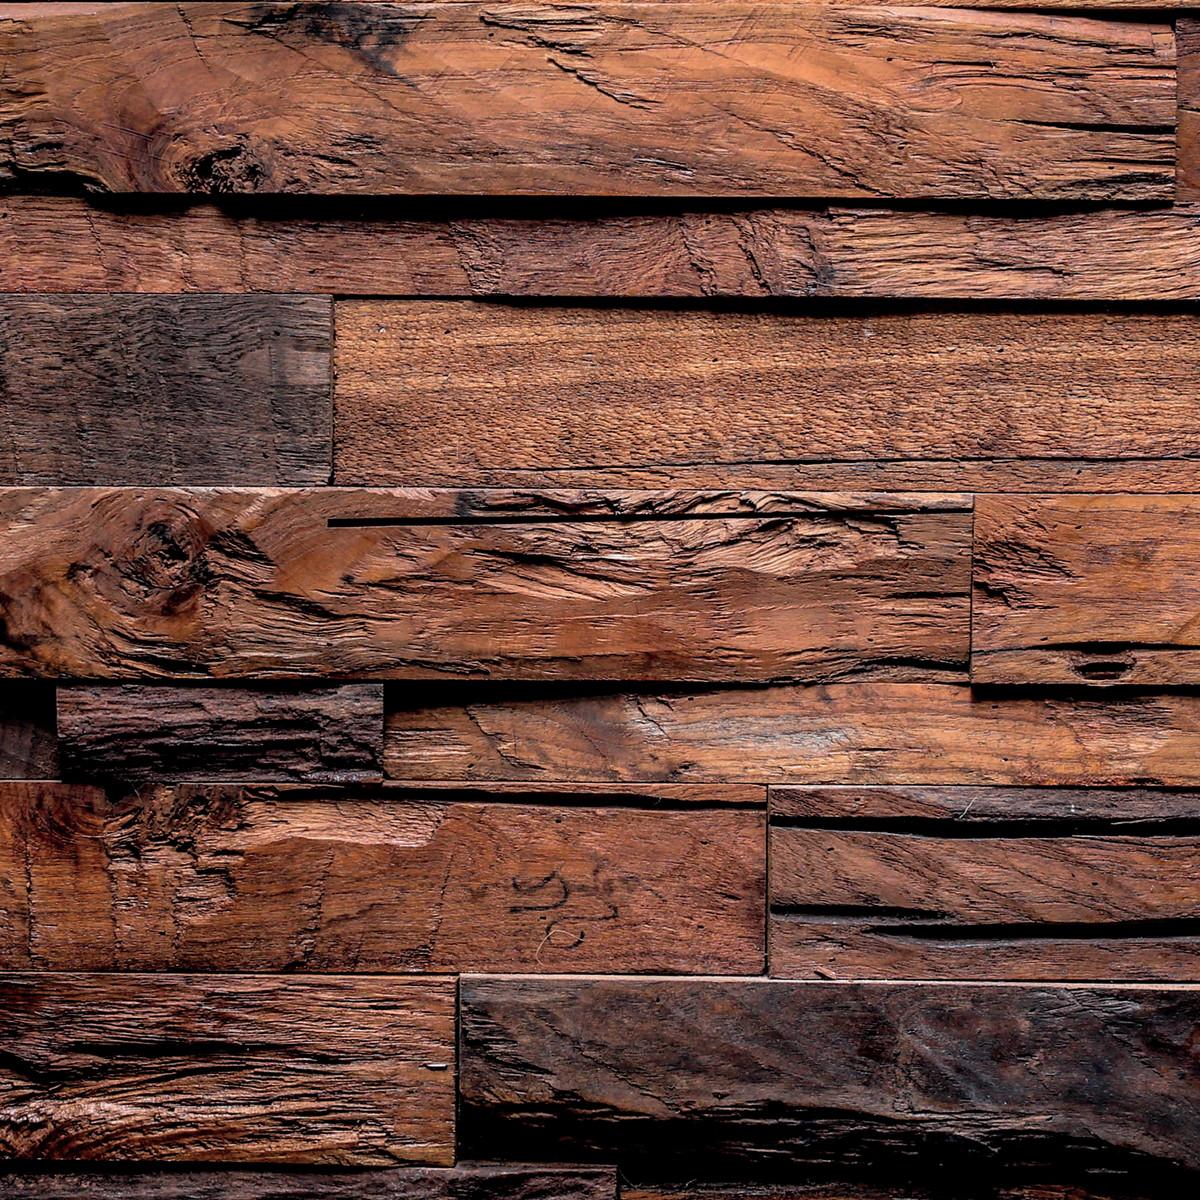 Adesivo de parede papel parede madeira r stica escura no - Papel adhesivo para paredes ...